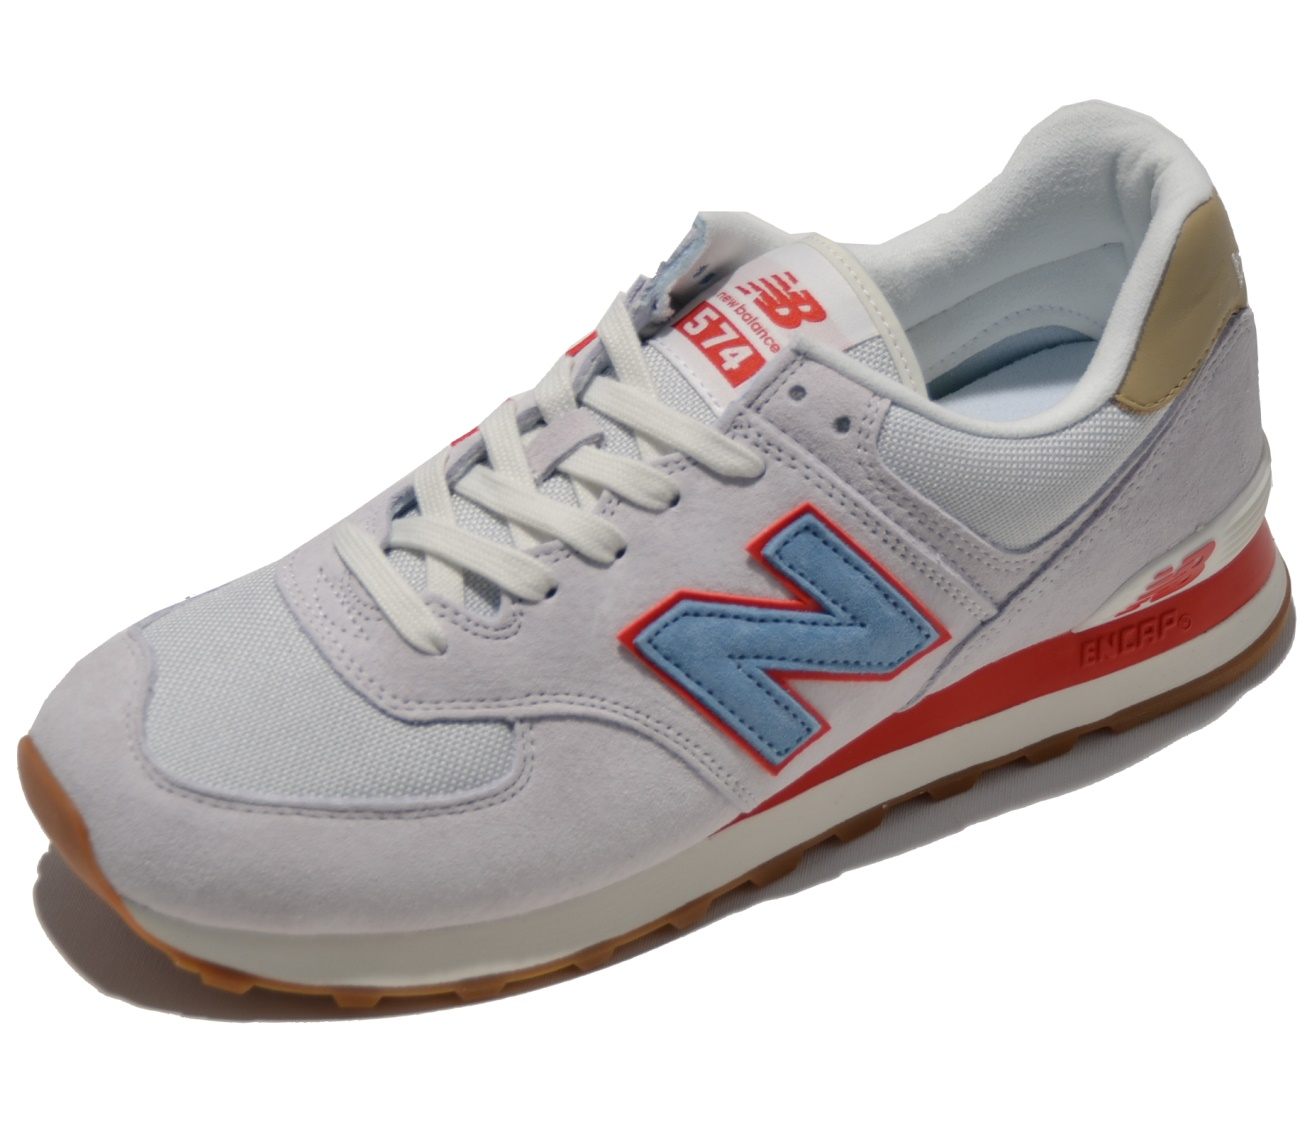 98cf9b12c7d710 New Balance Laufschuhe ML574NCB - New Balance New Balance - Ultras ...